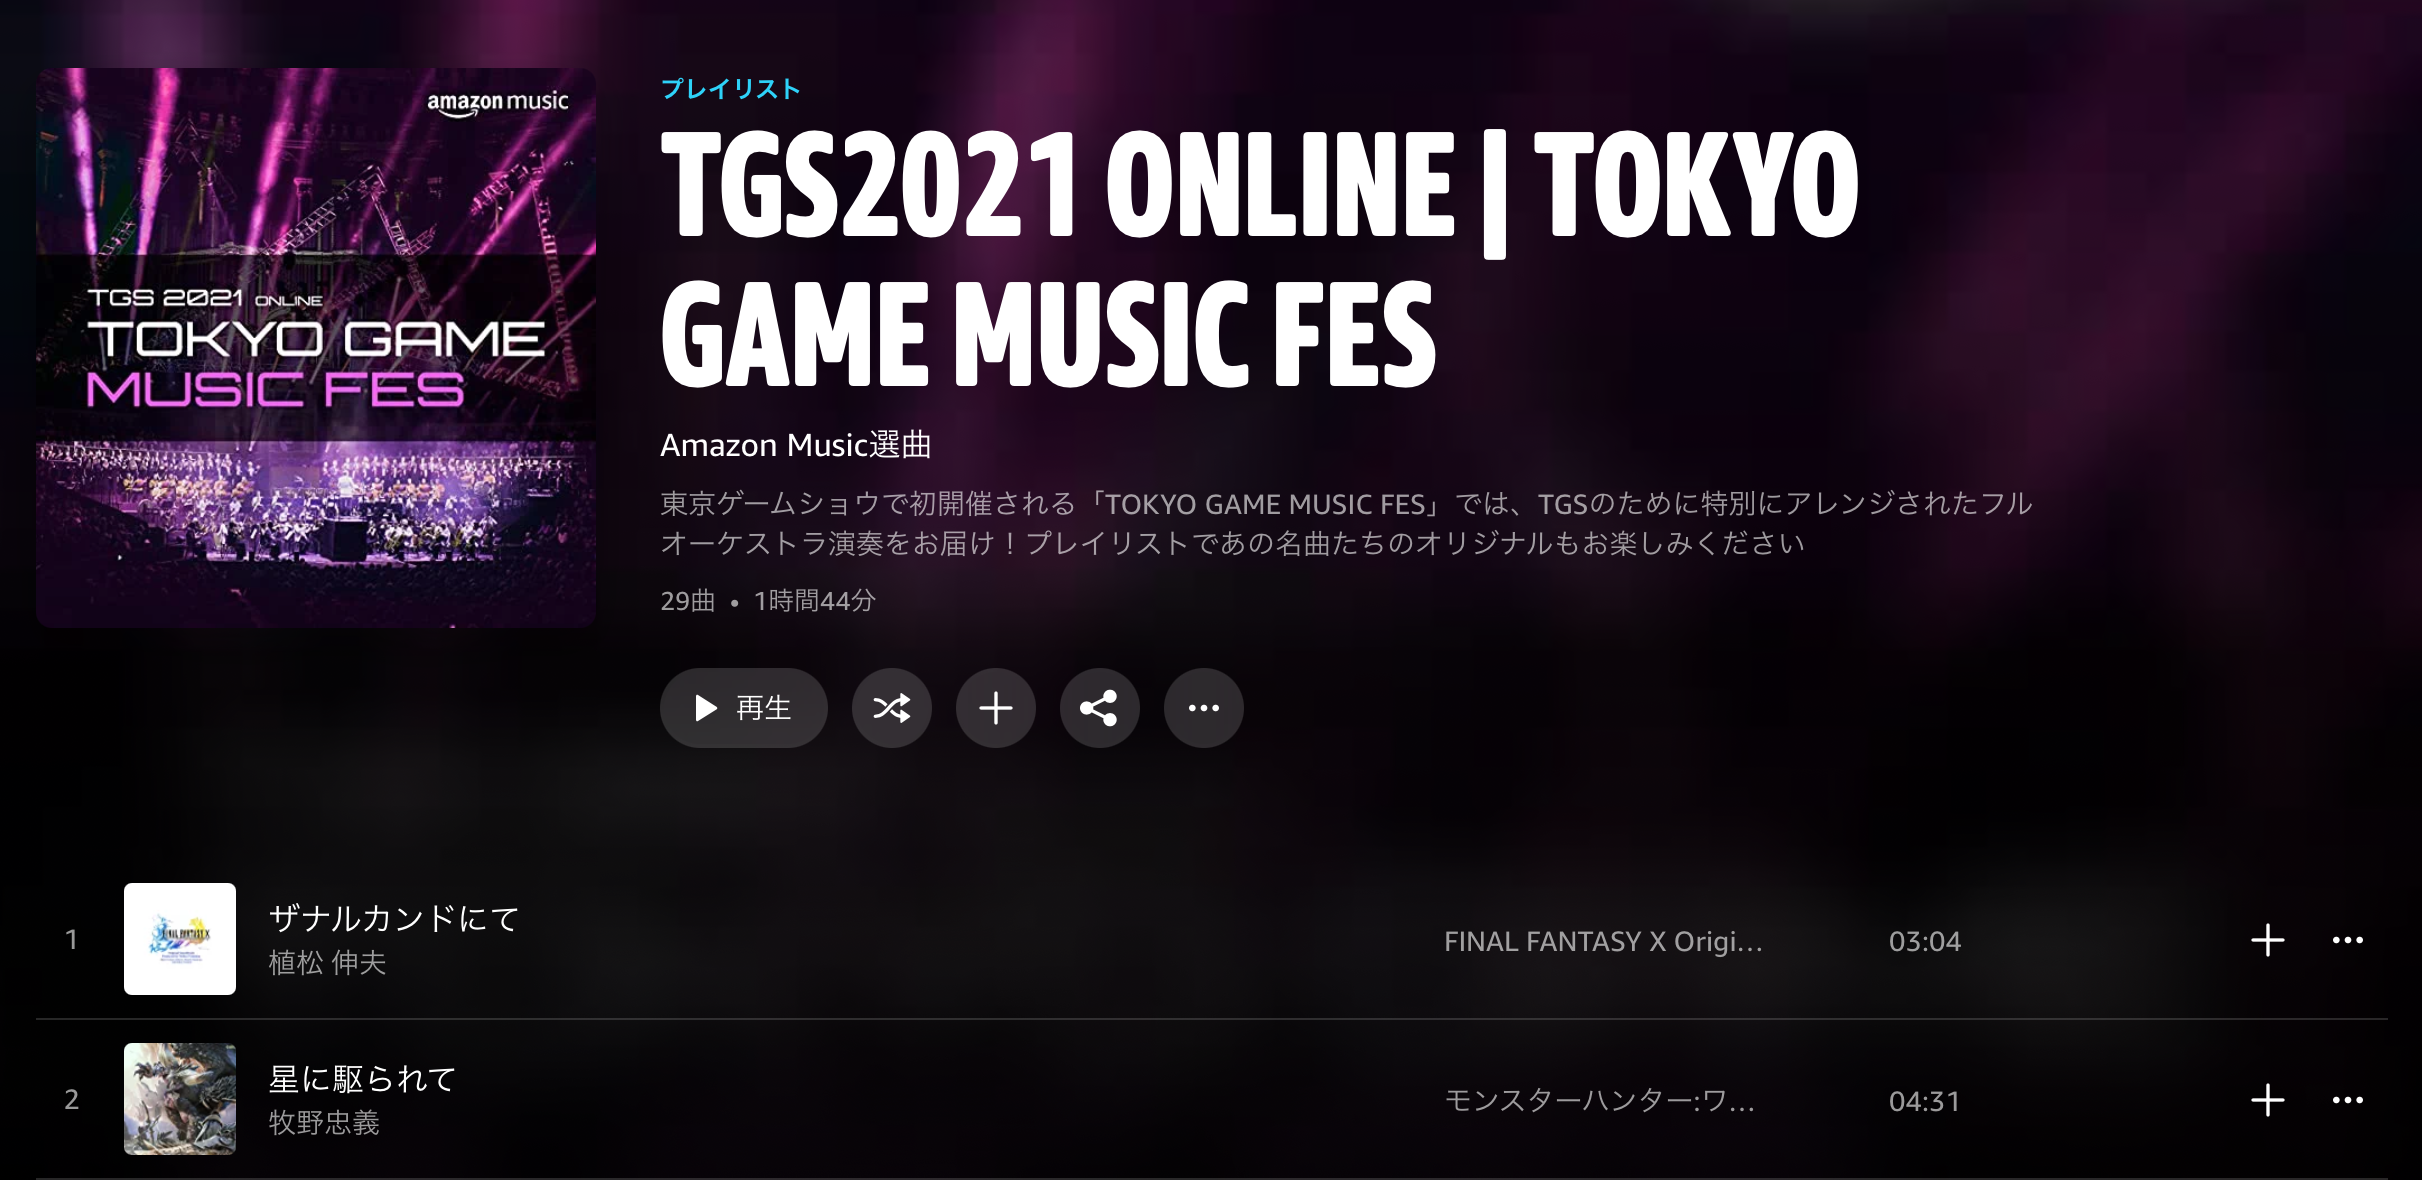 TGS2021 ONLINE   TOKYO GAME MUSIC FES プレイリスト